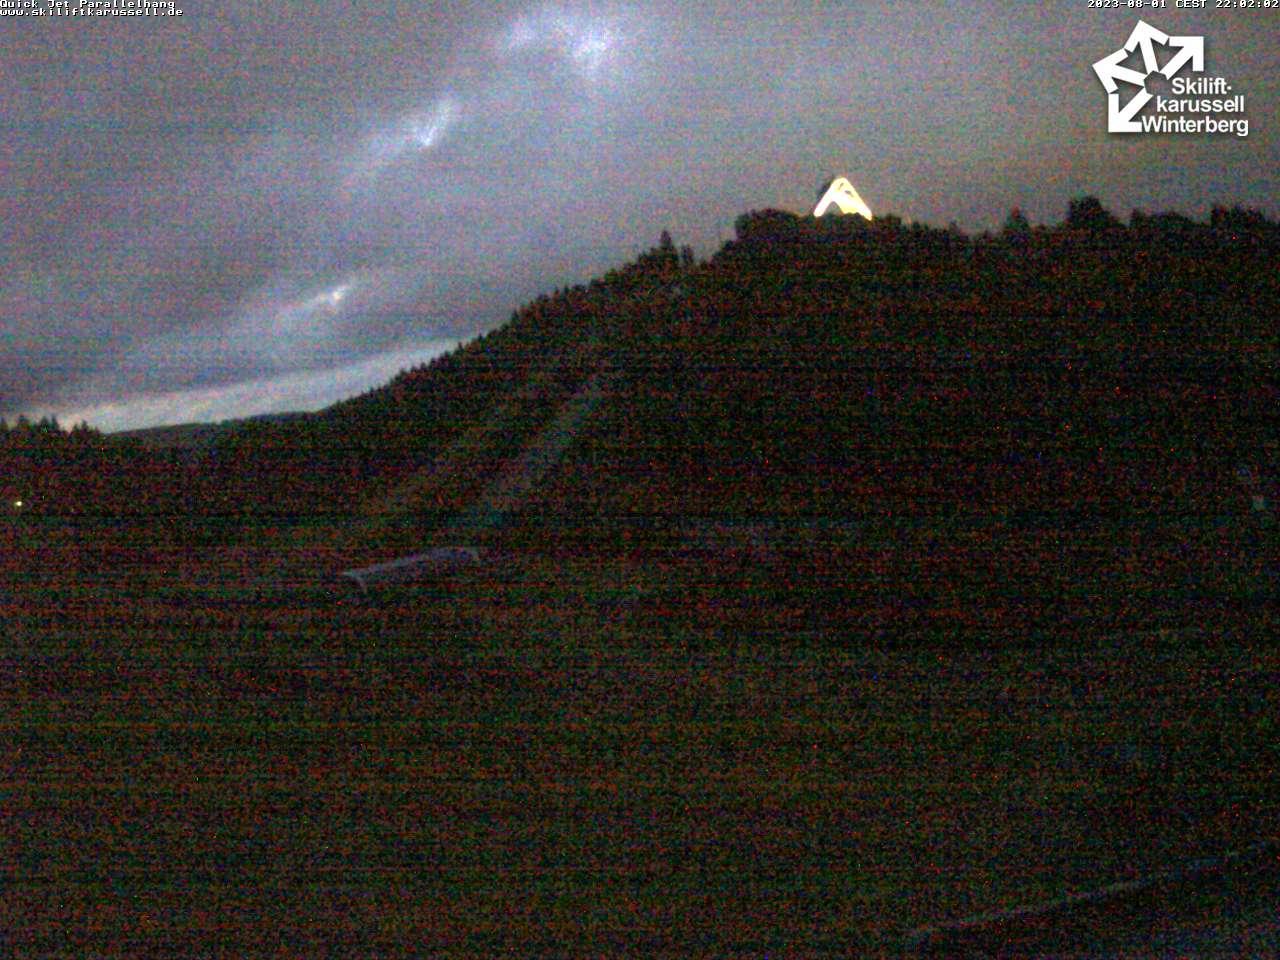 Webcam Quick Jet Parallelhang - Skilifkarussell Winterberg